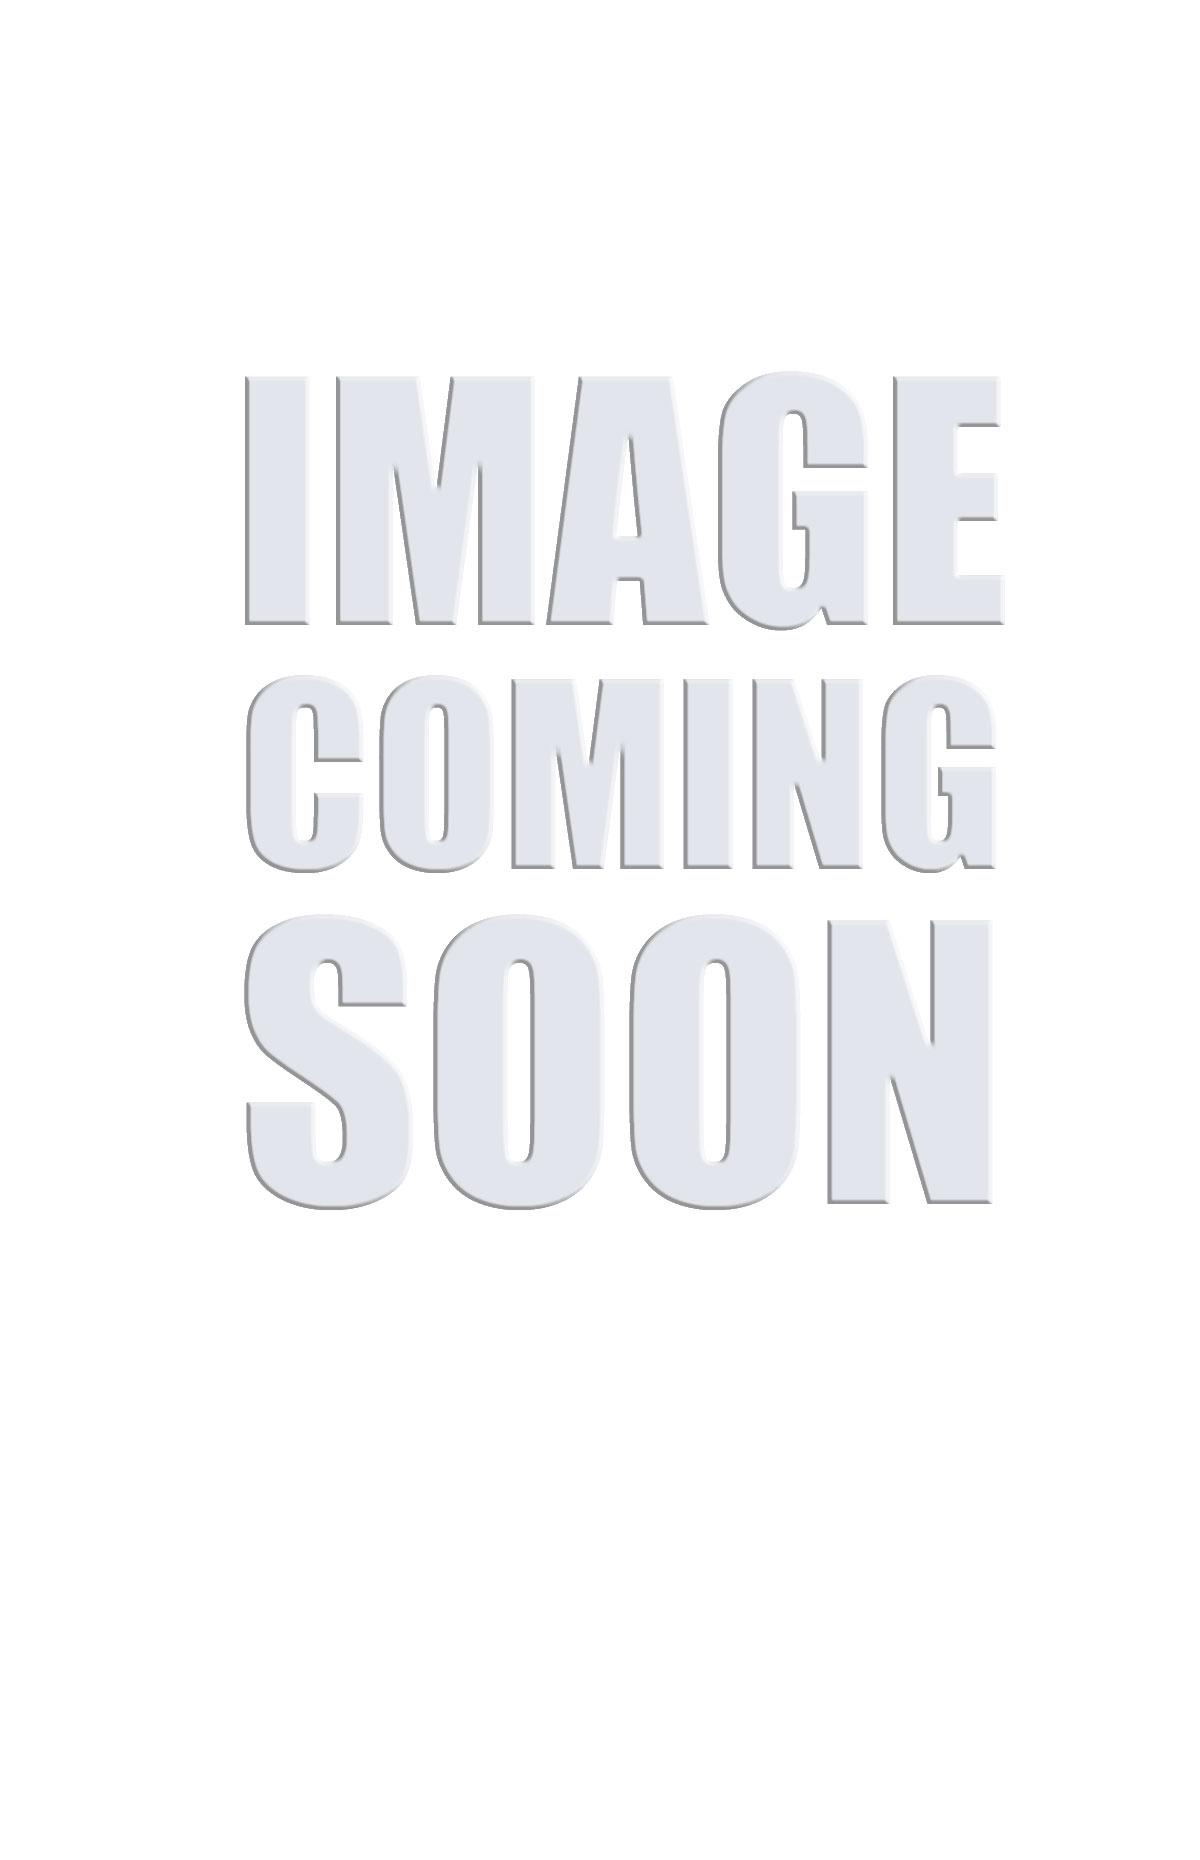 Tangential Discharge Vacuum Motor - Lamb # 116565-13, BPT, B/B, PB, AS, E, 3 STG